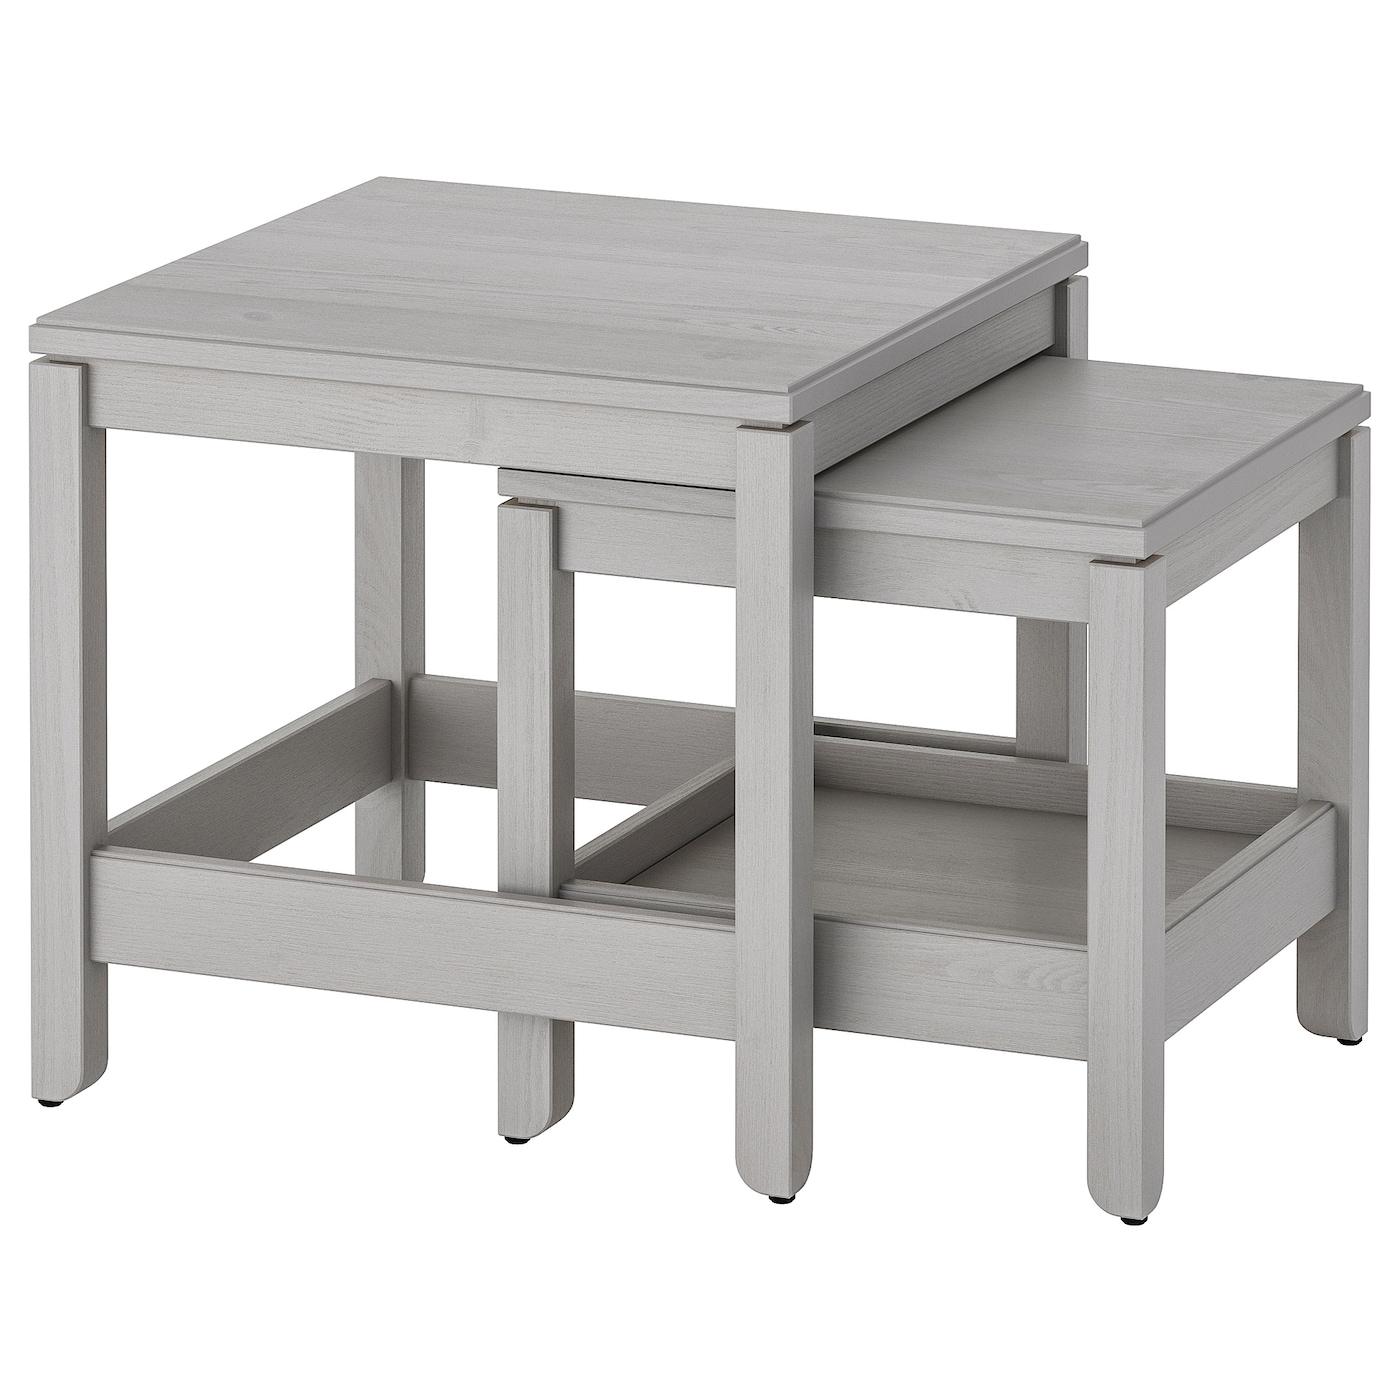 The Furniture Outlet Portland Oak Nest of Tables